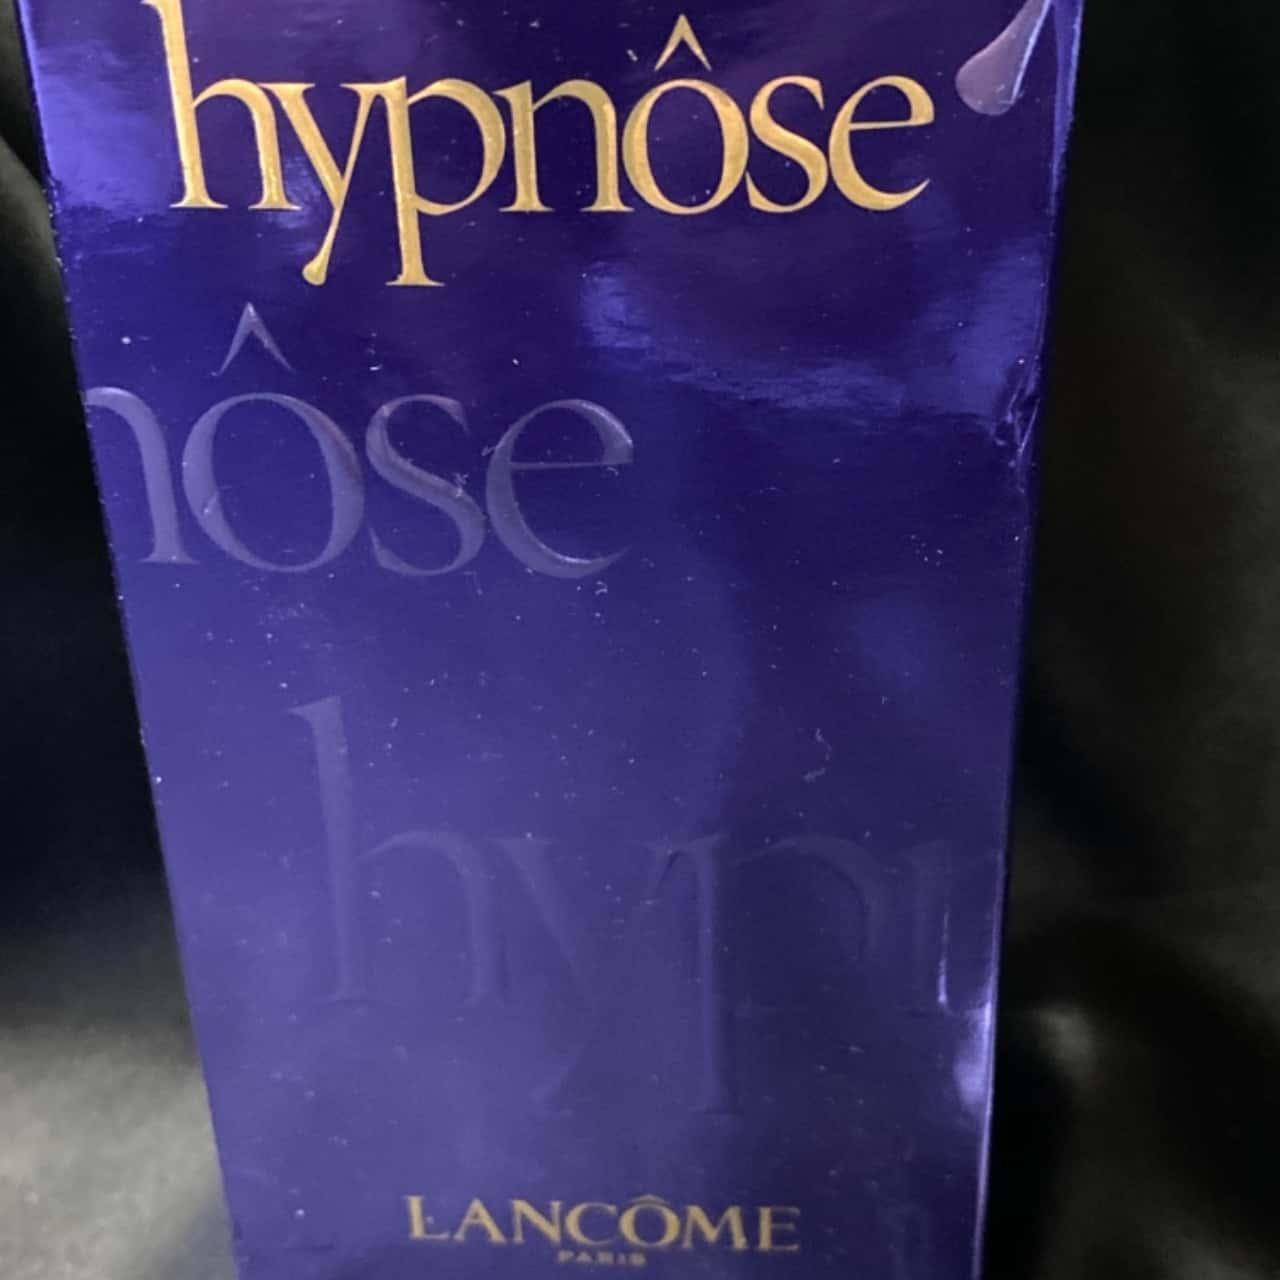 Hypnose by Lancôme